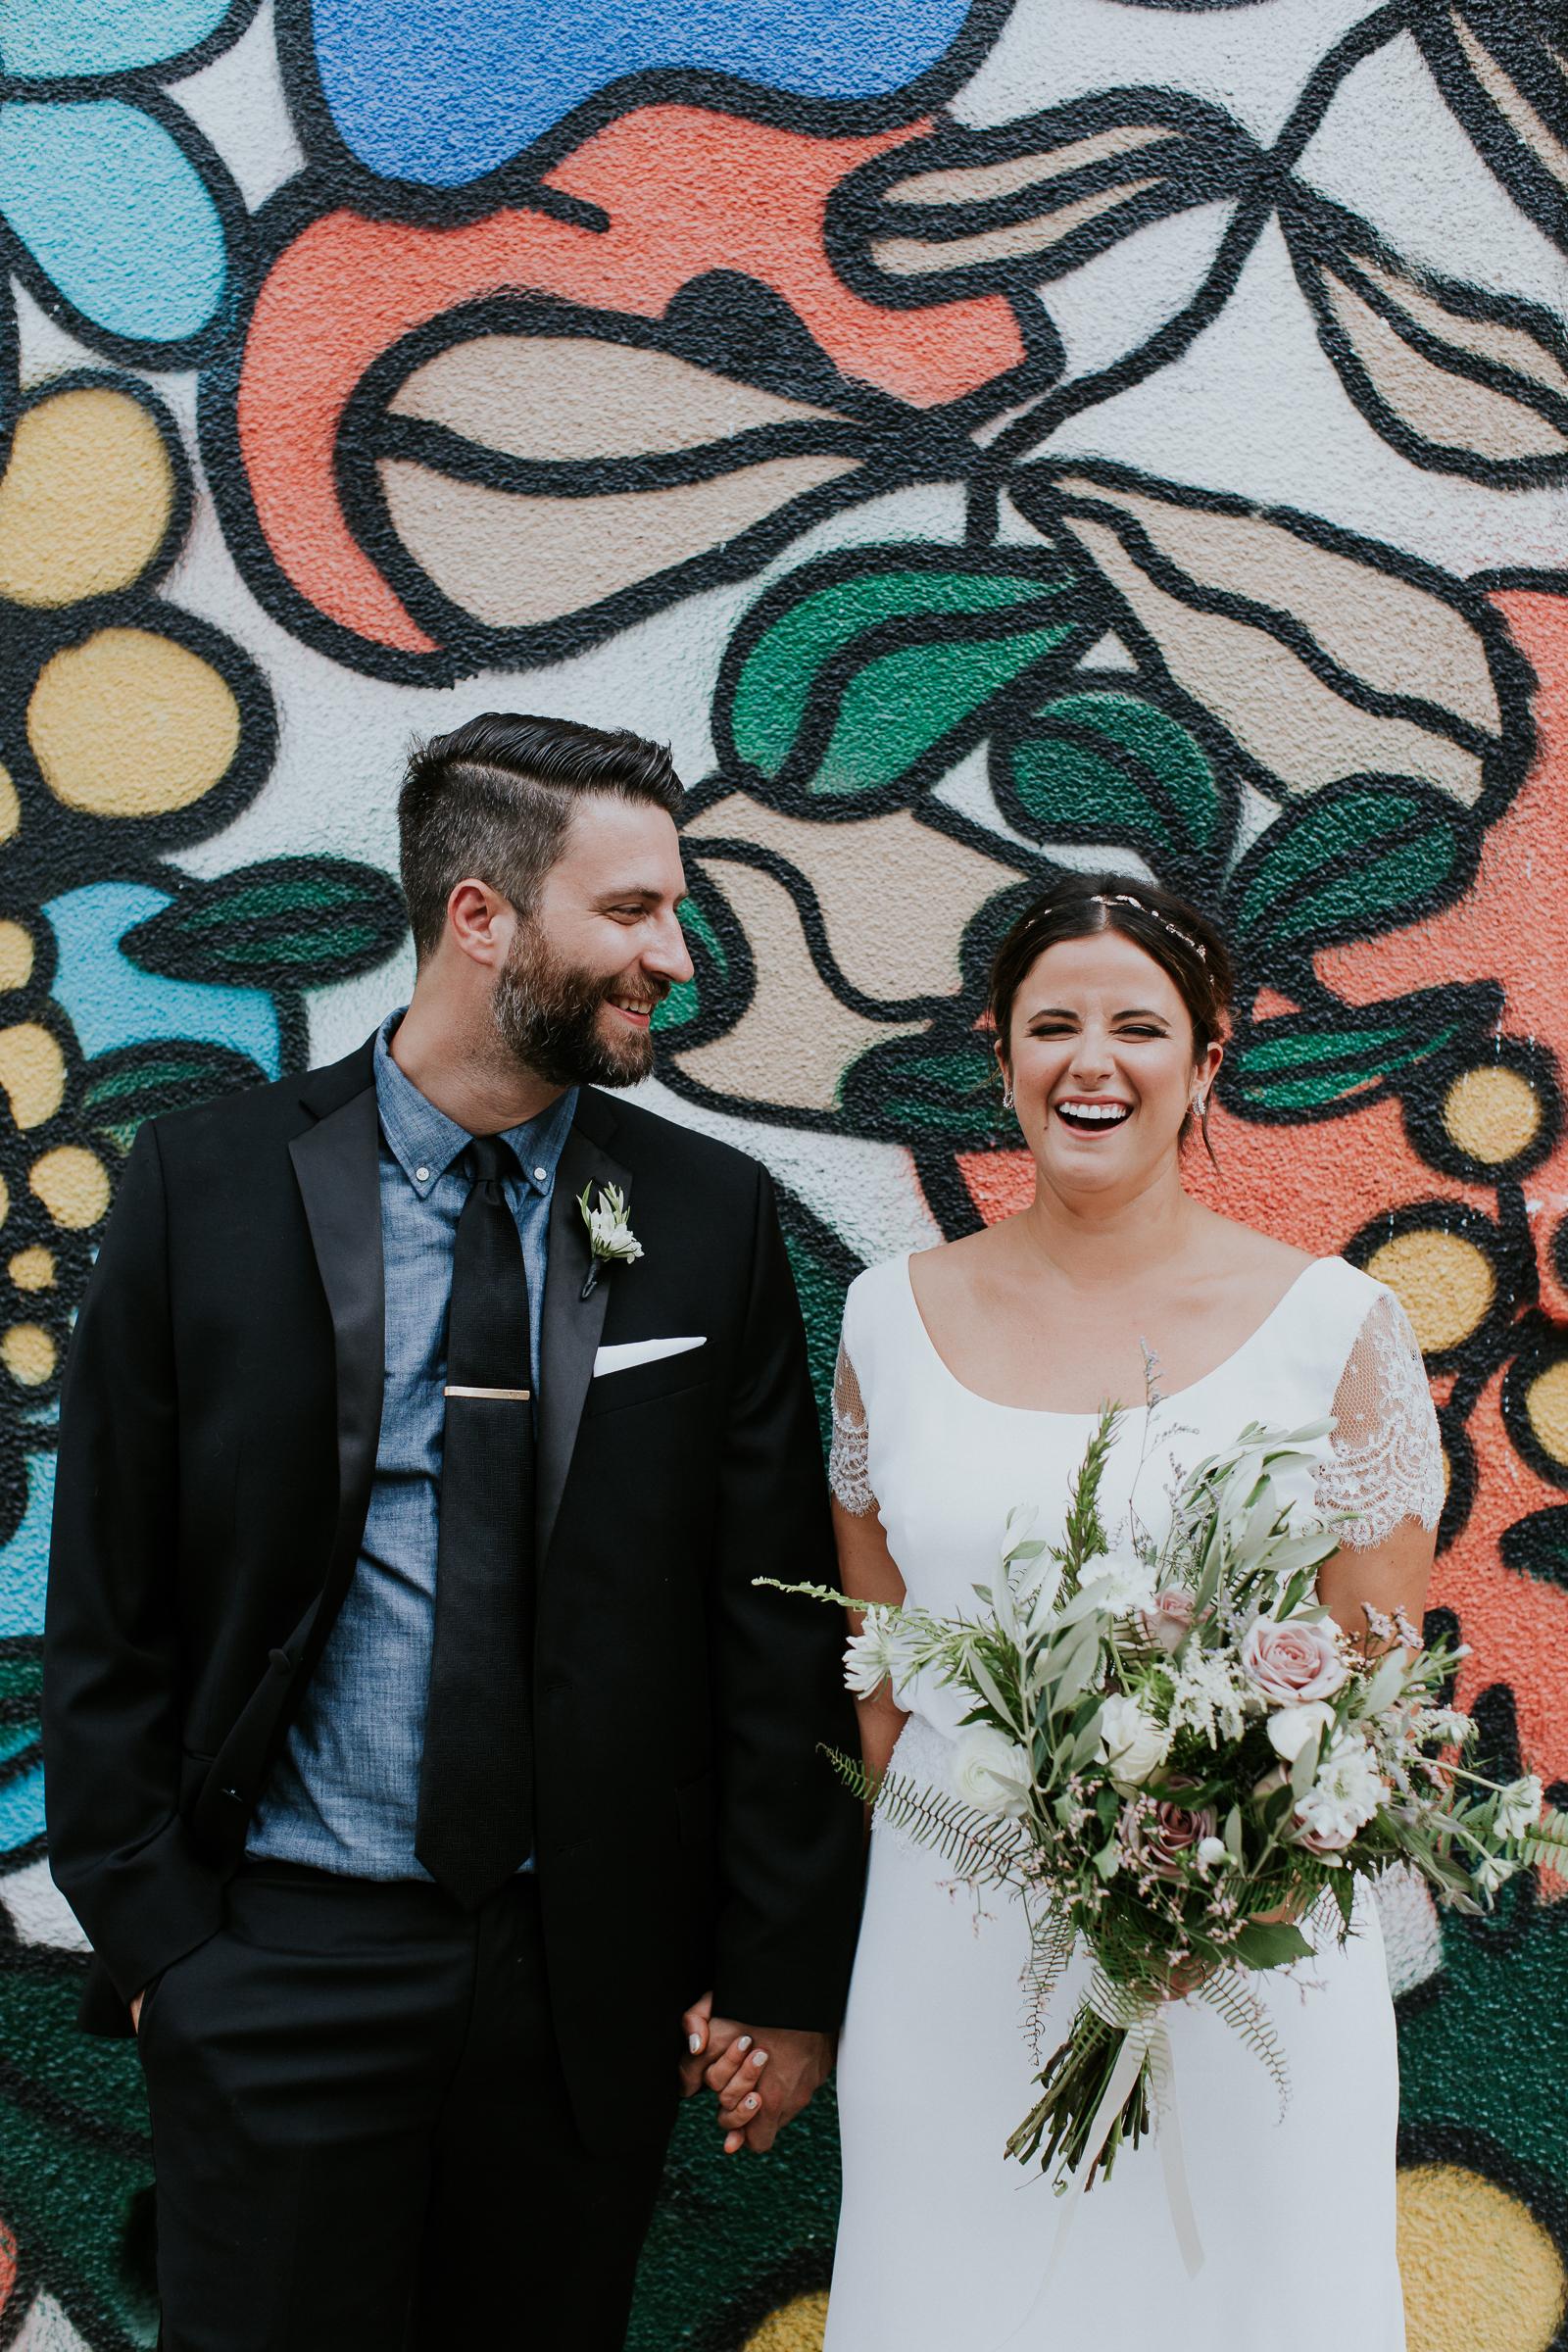 501-Union-Brooklyn-Fine-Art-Documentary-Wedding-Photographer-47.jpg